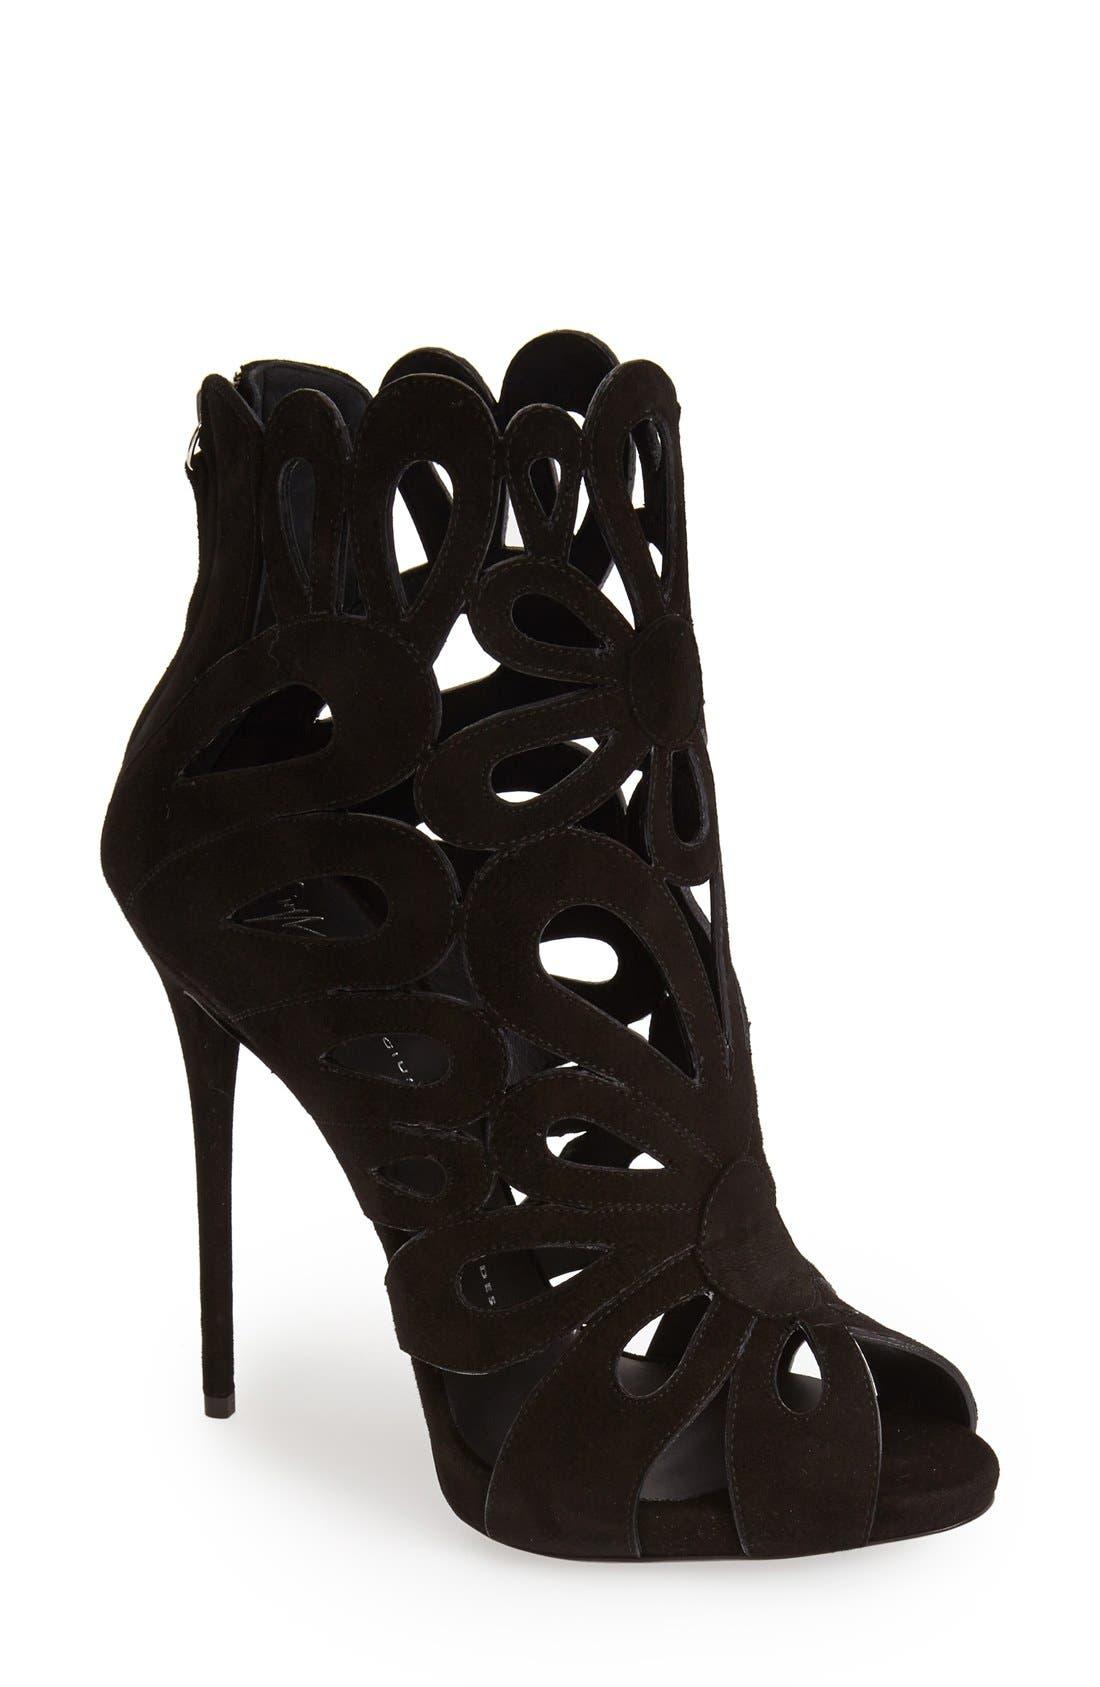 Alternate Image 1 Selected - Giuseppe Zanotti 'Coline' Leather Cage Bootie (Women)